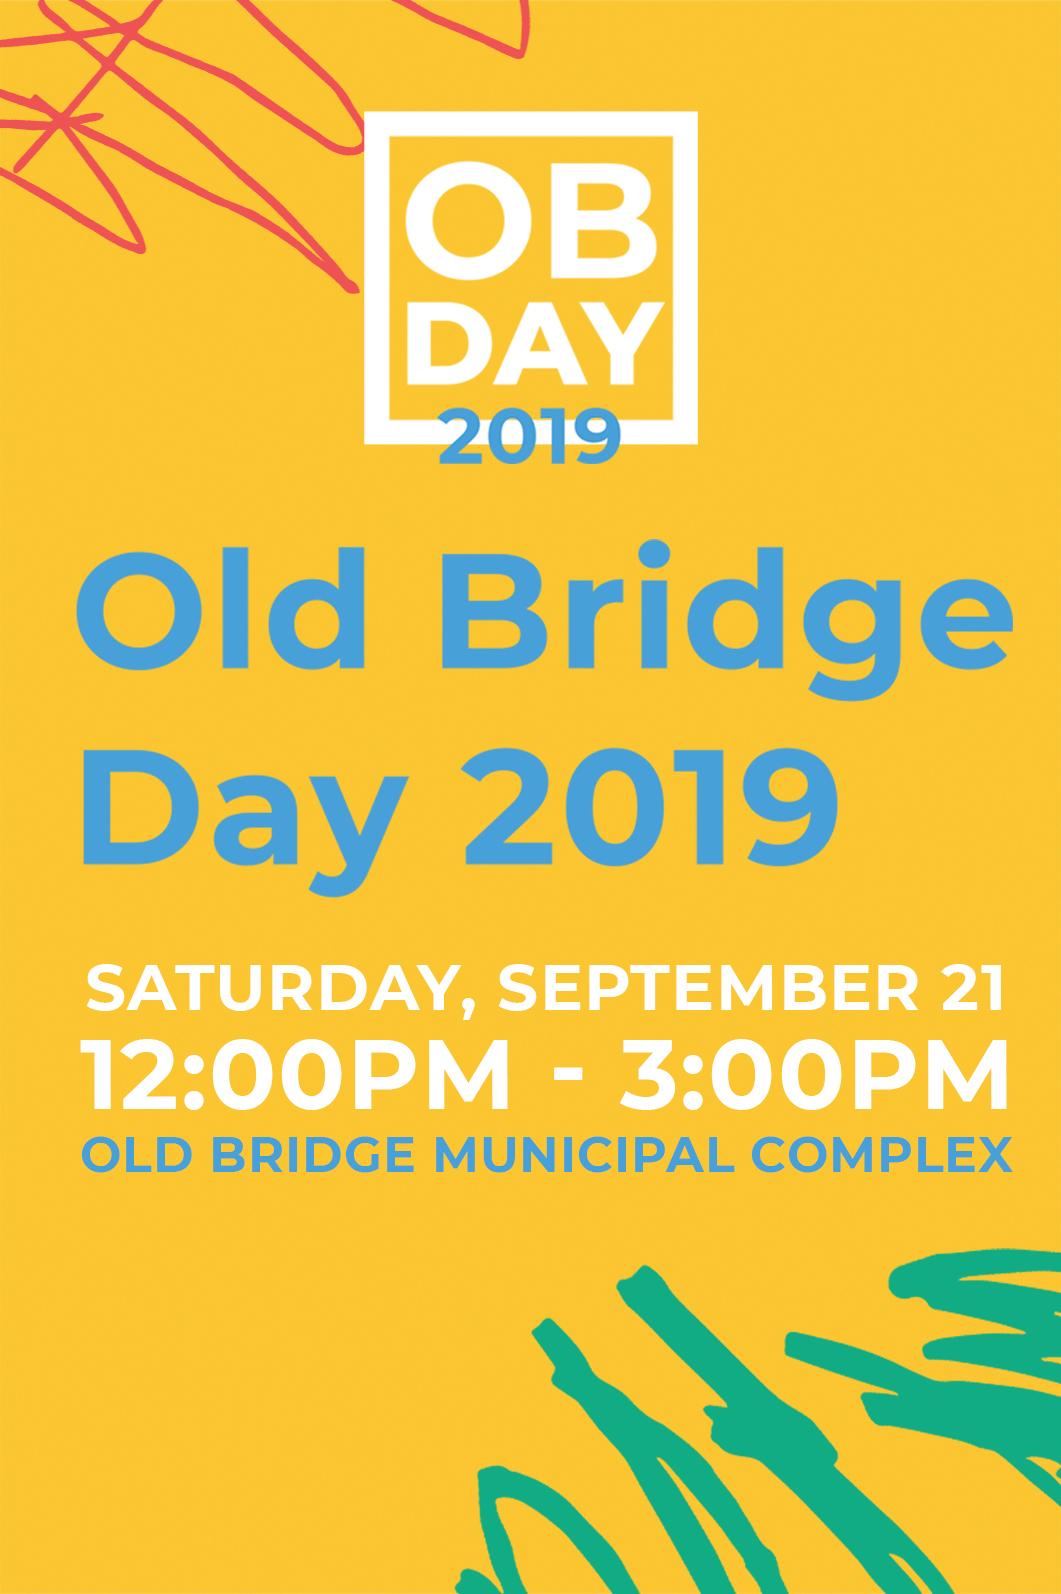 Church_Old Bridge Day 2019 (3).jpg